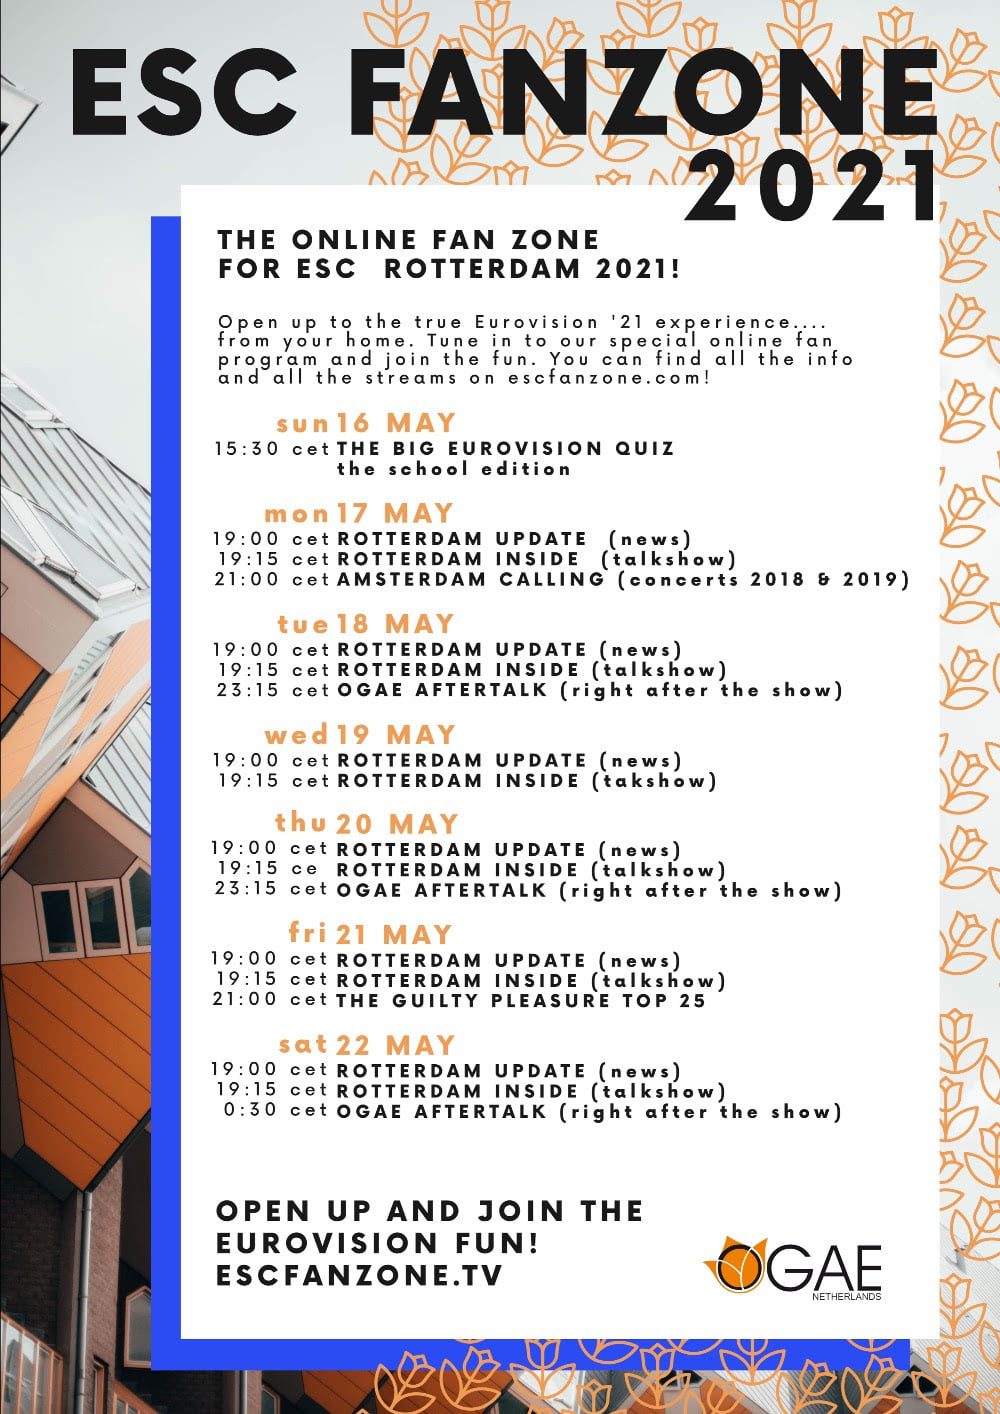 ESC Fanzone 2021 OGAE Netherlands